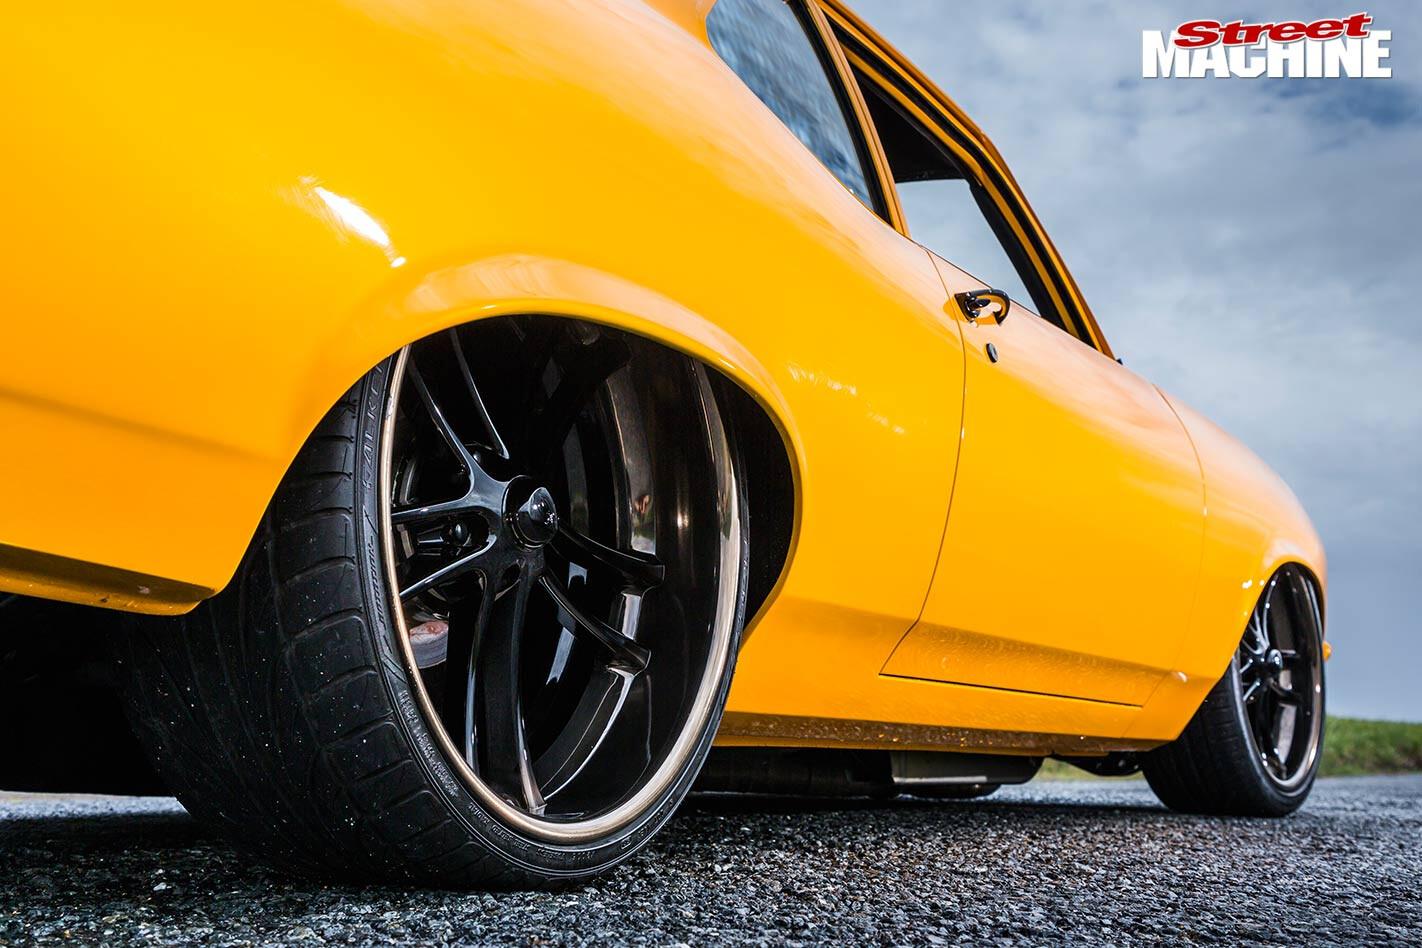 Chevrolet Nova wheel